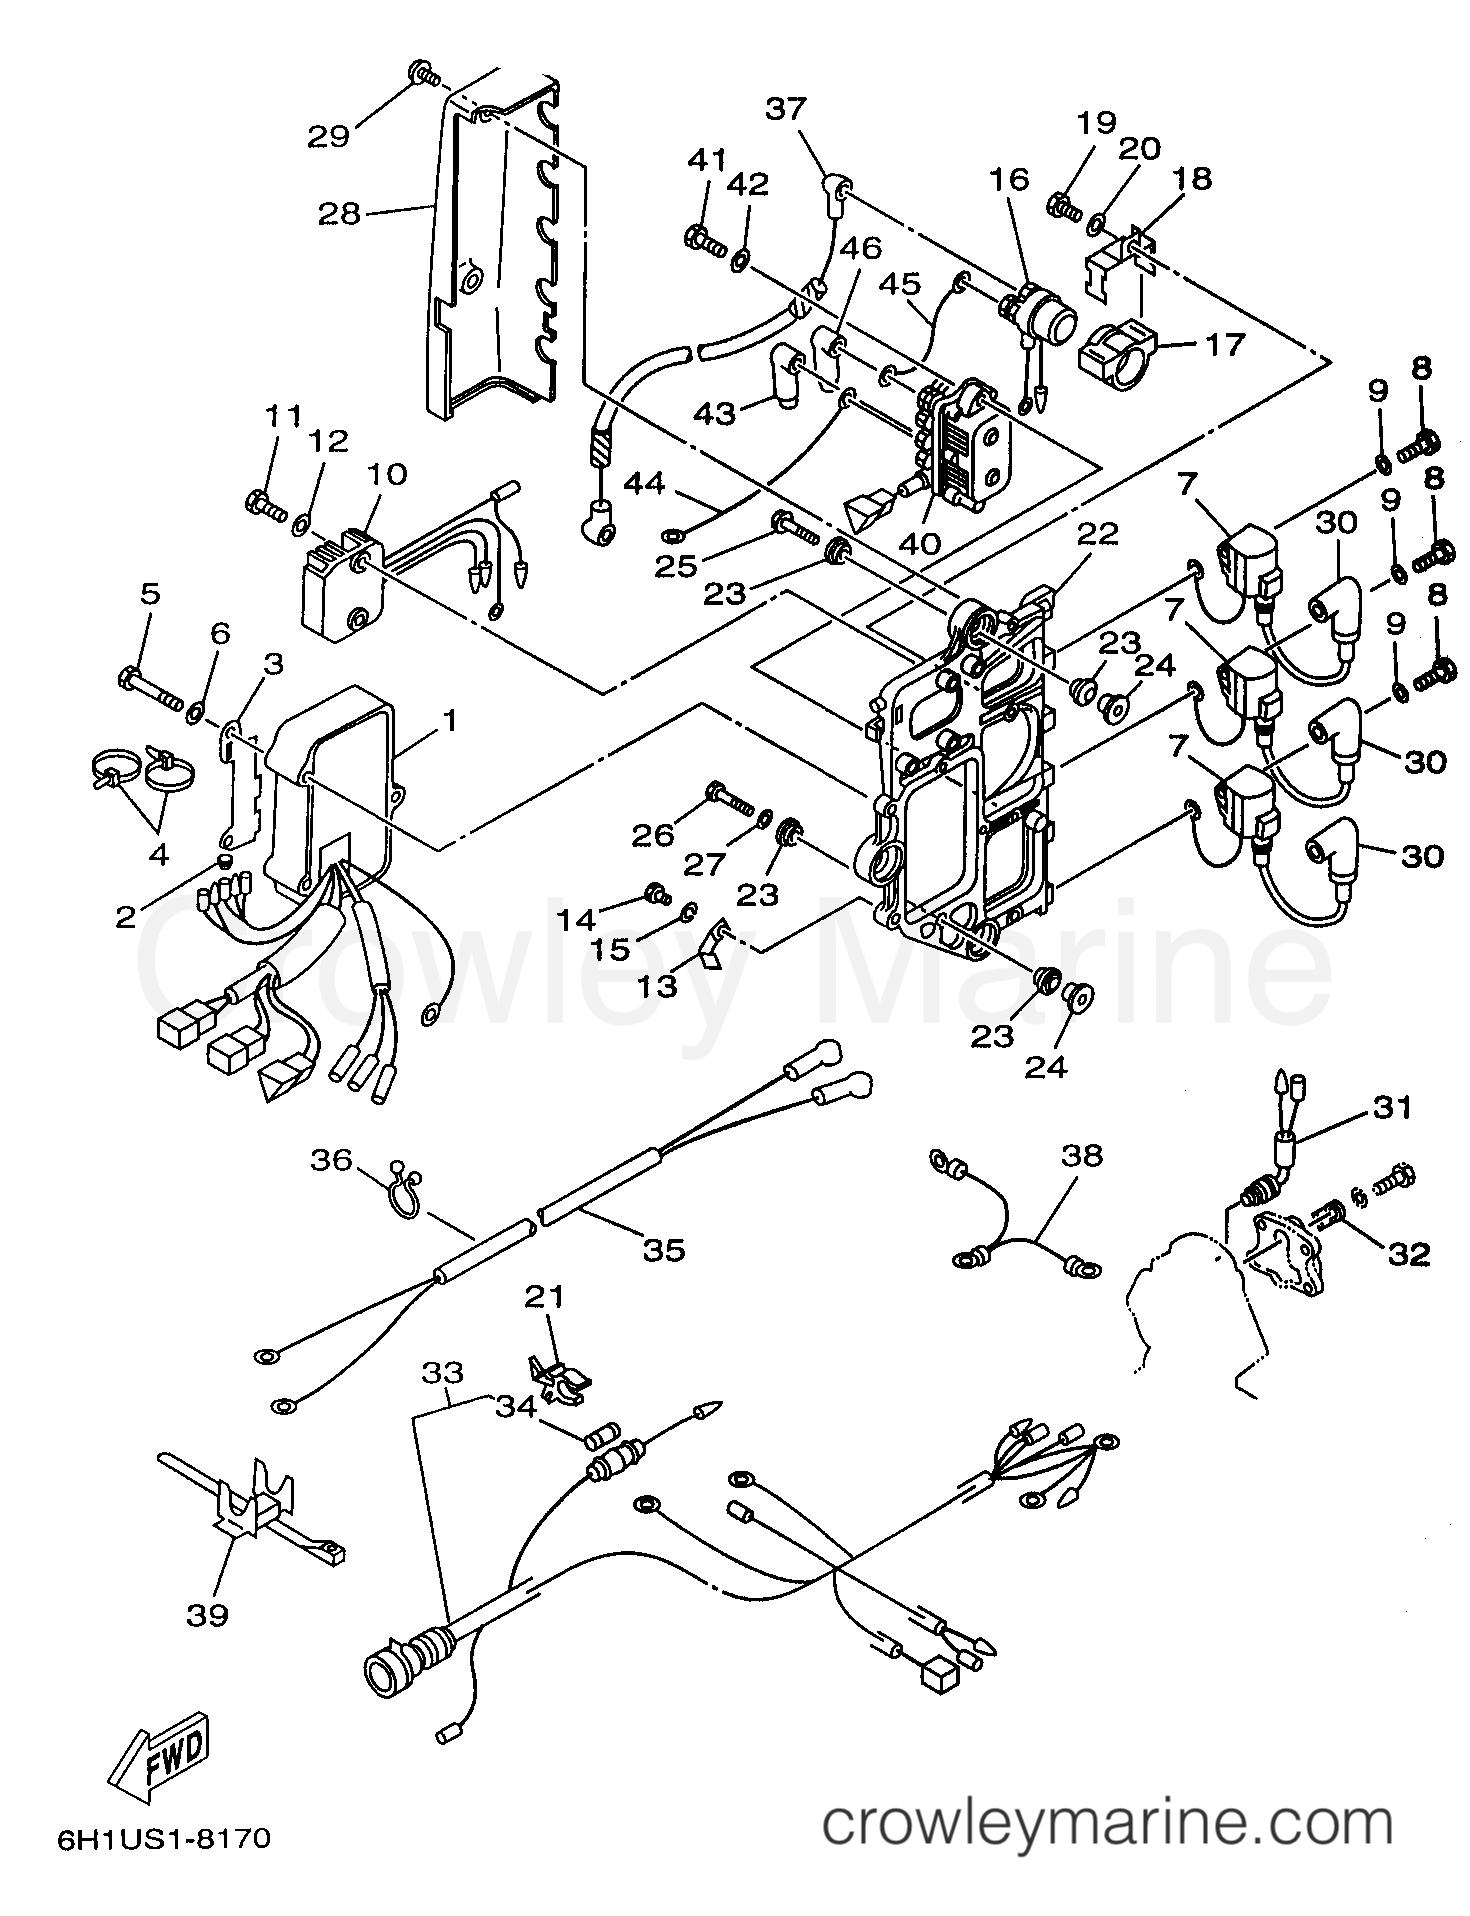 [EQHS_1162]  ELECTRICAL 1 - 1998 Yamaha Outboard 90hp C90TLRW | Crowley Marine | 1998 Yamaha Outboard Wiring Diagram |  | Crowley Marine